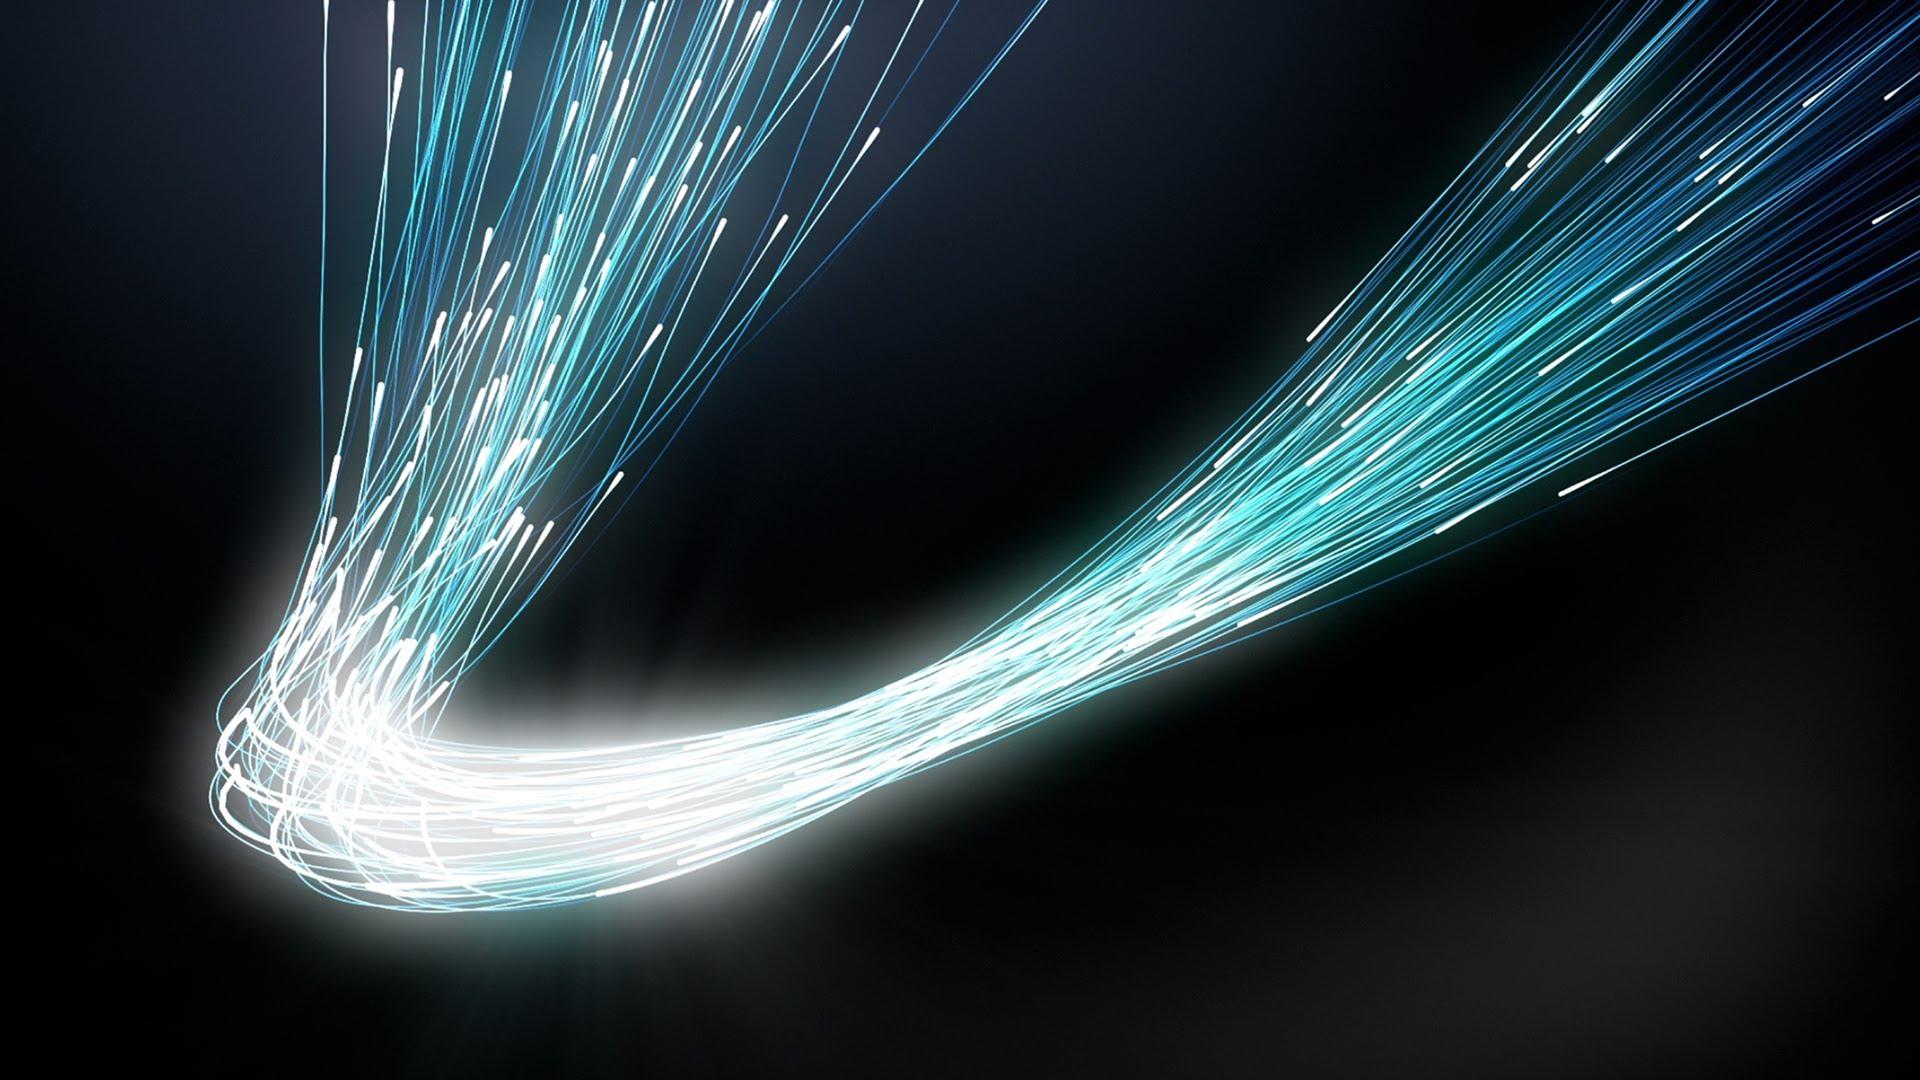 Thin Fiber Optic Cables Concept Background   Loop 1920x1080